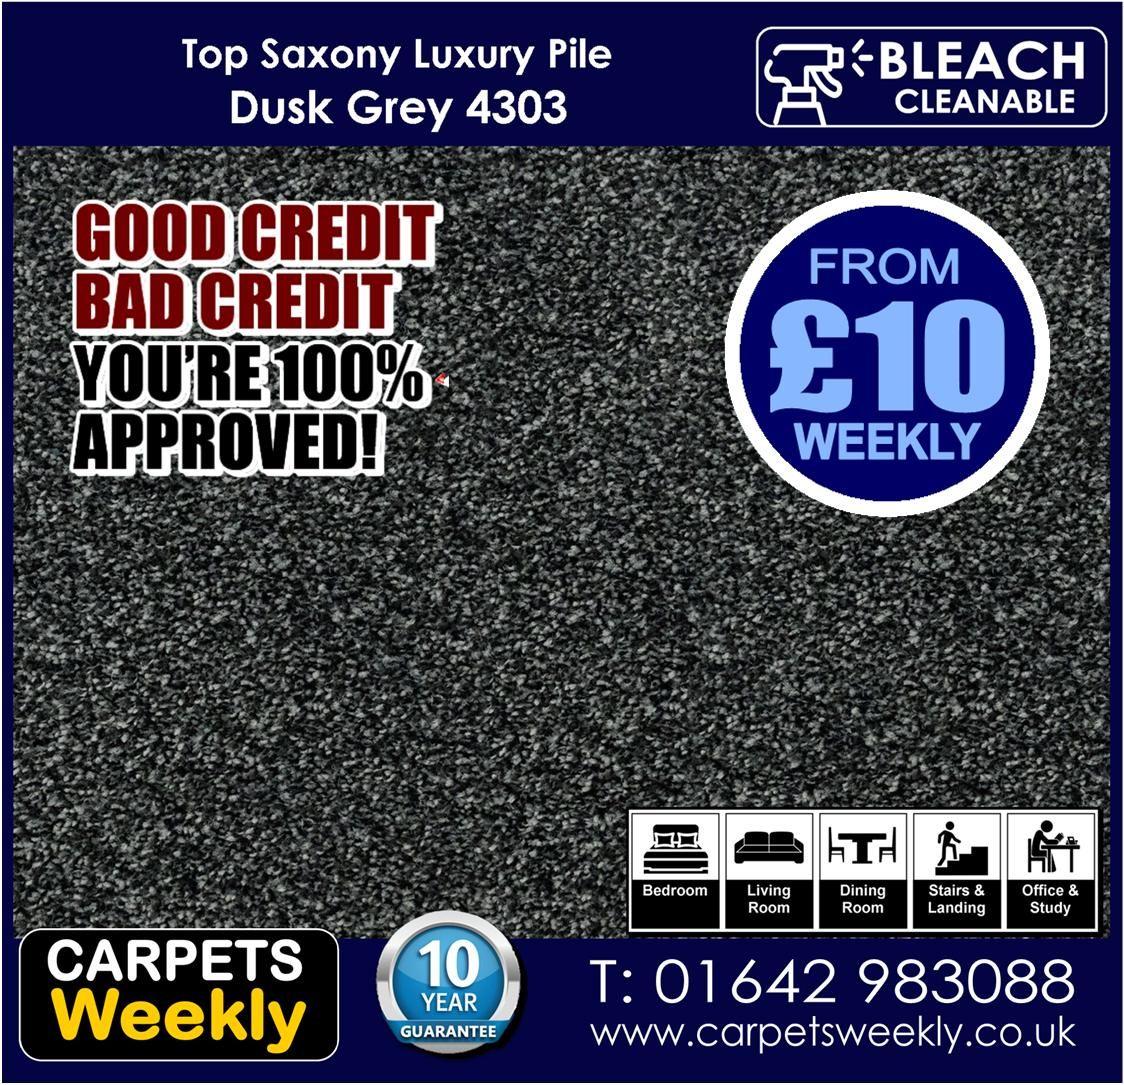 Dusk Grey Top Saxony Carpet from Carpets Weekly www.carpetsweekly.co.uk Tel 08007720966